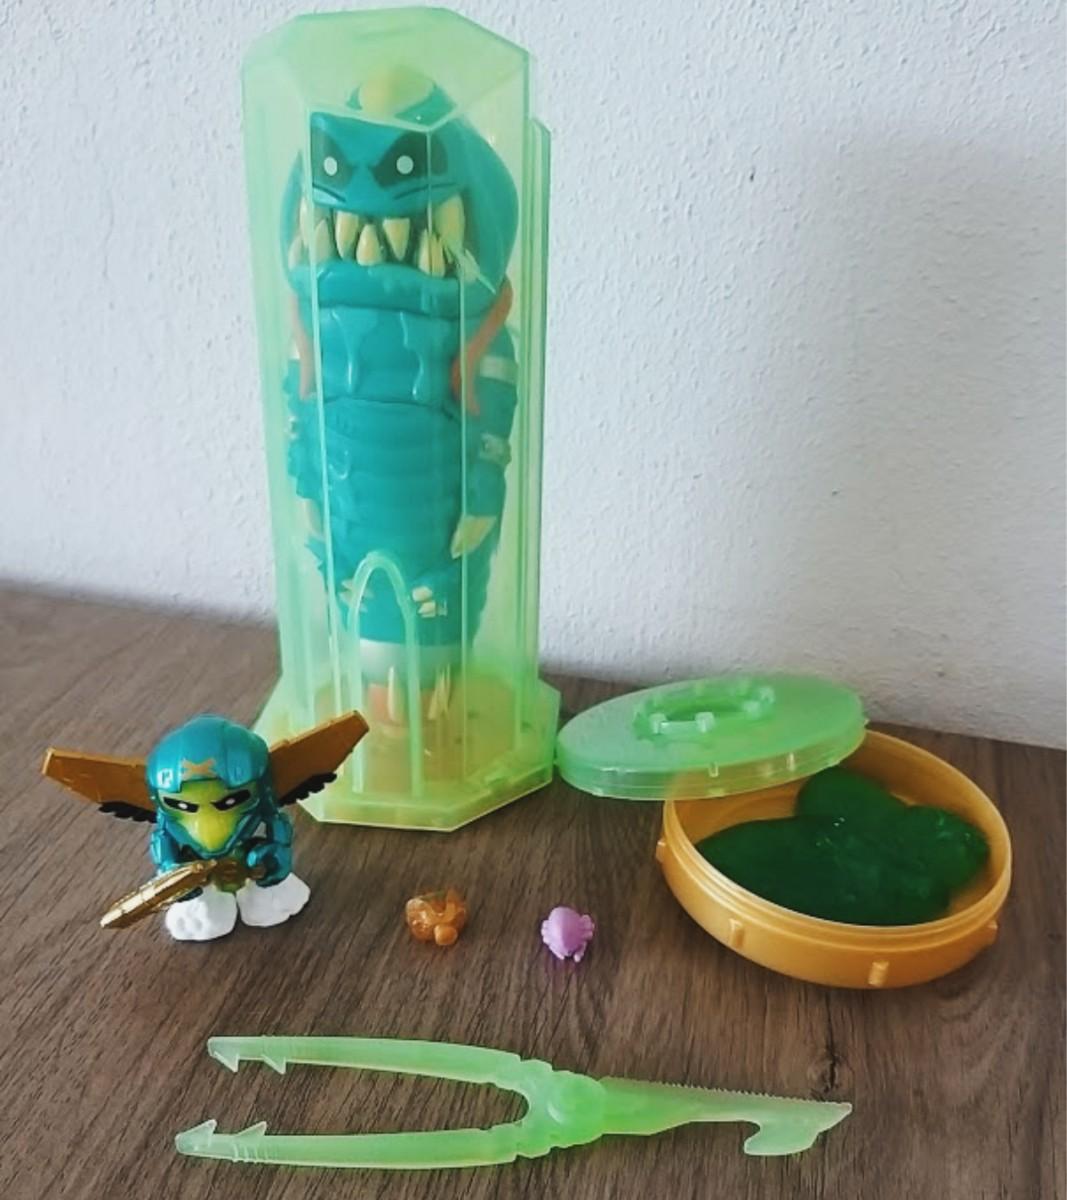 Inhoud Treasure X Aliens Mystery Pack Action Figure & Playset